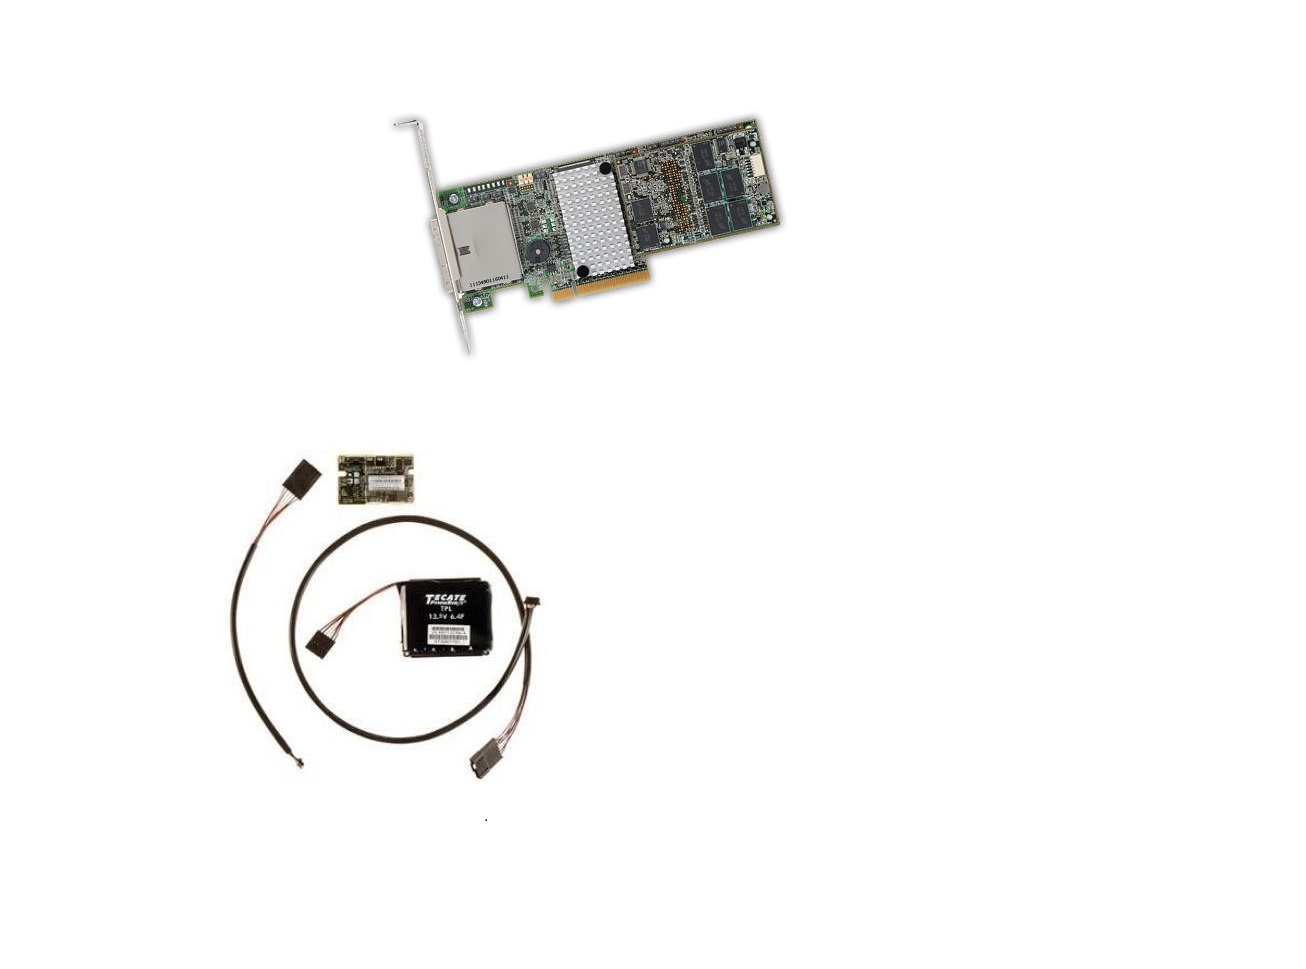 LSI Logic MegaRaid 9286CV-8e 8-Ports SAS PCI Express 3.0 RAID Controller w/Battery